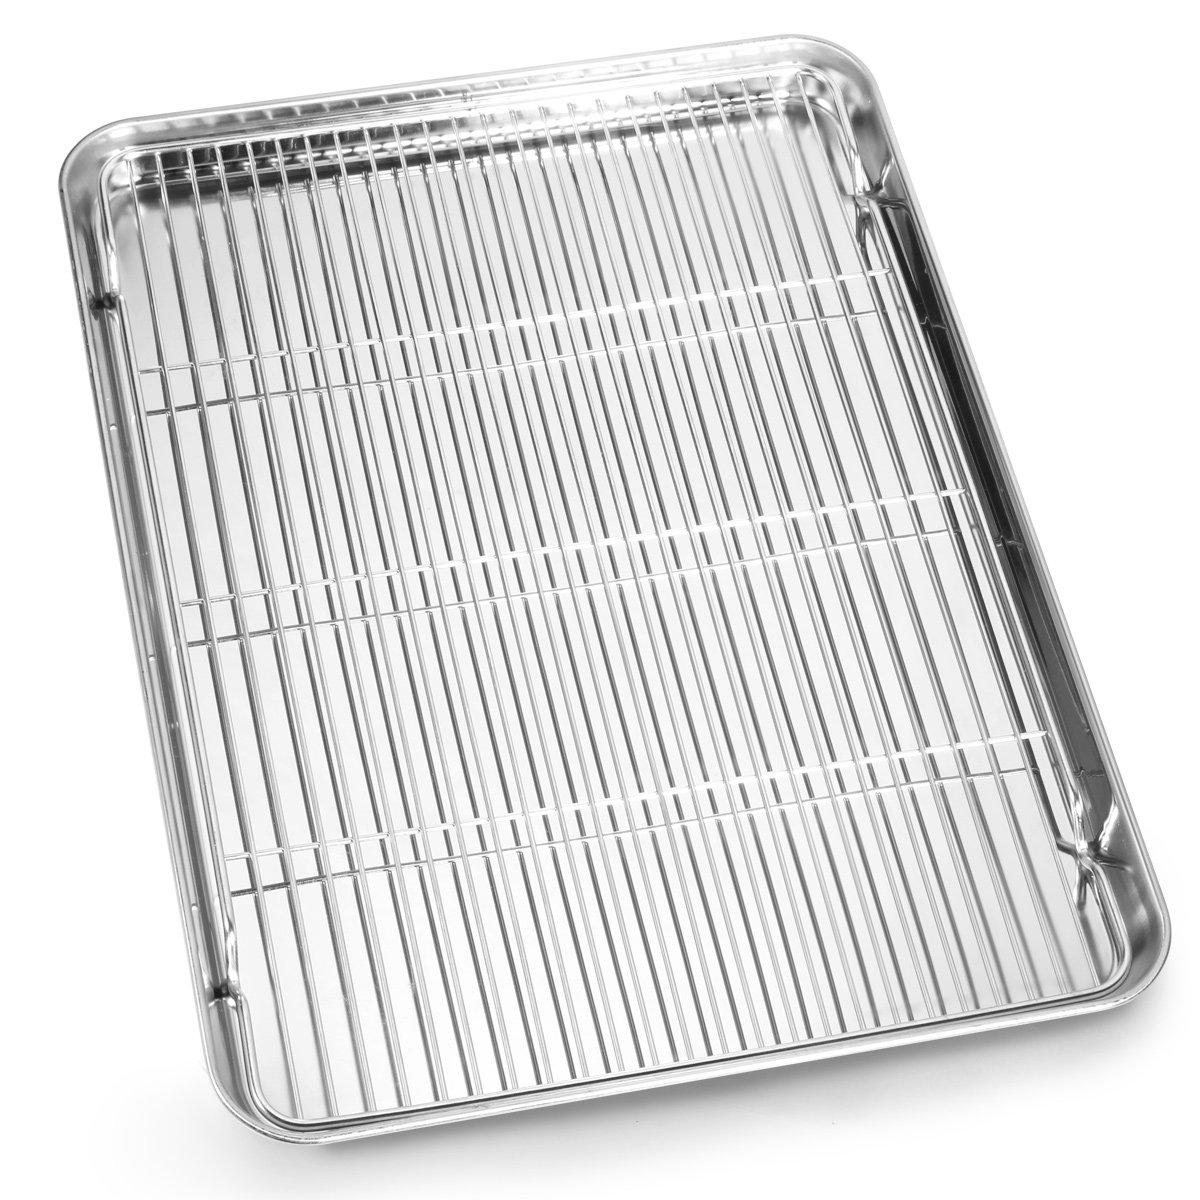 Baking Sheet and Rack Set, Bastwe Stainless Steel Cookie Sheet Baking Pan with Cooling Rack Set, Rectangle Size 16×12×1 inch, Non Toxic & Healthy, Mirror Finish & Rust Free, Dishwasher Safe